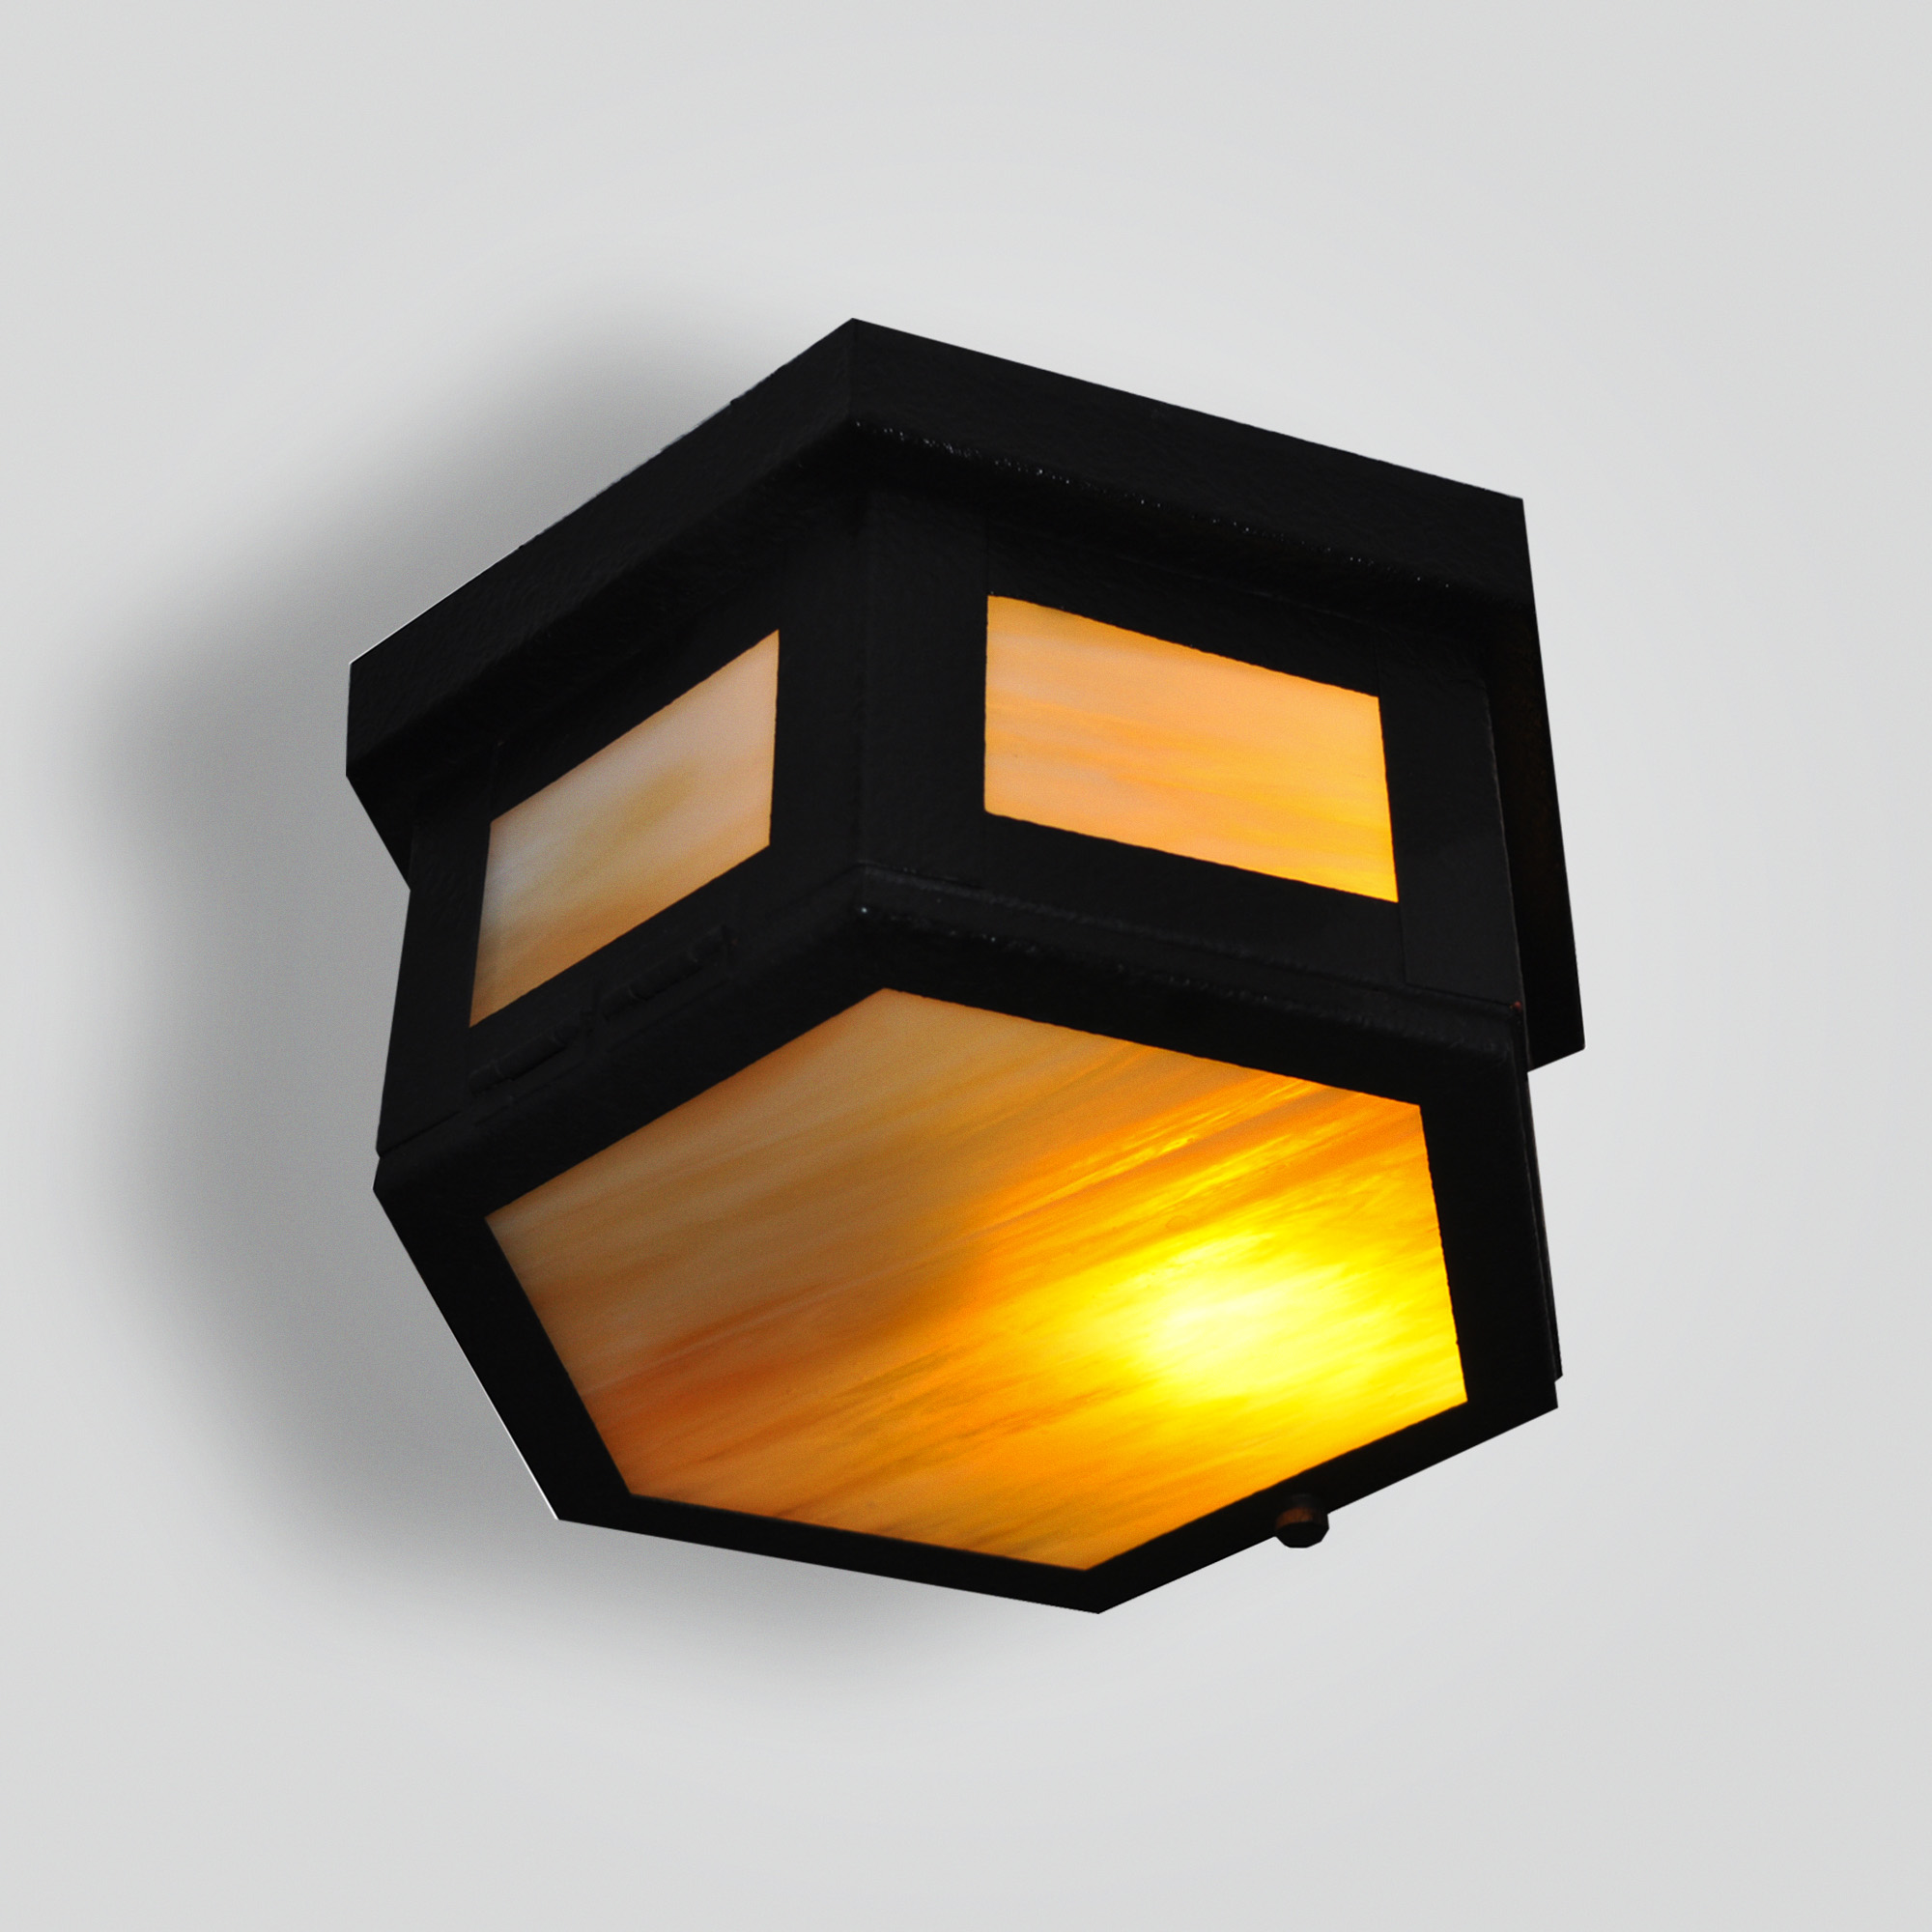 7260-cb2-br-h-sh – ADG Lighting Collection